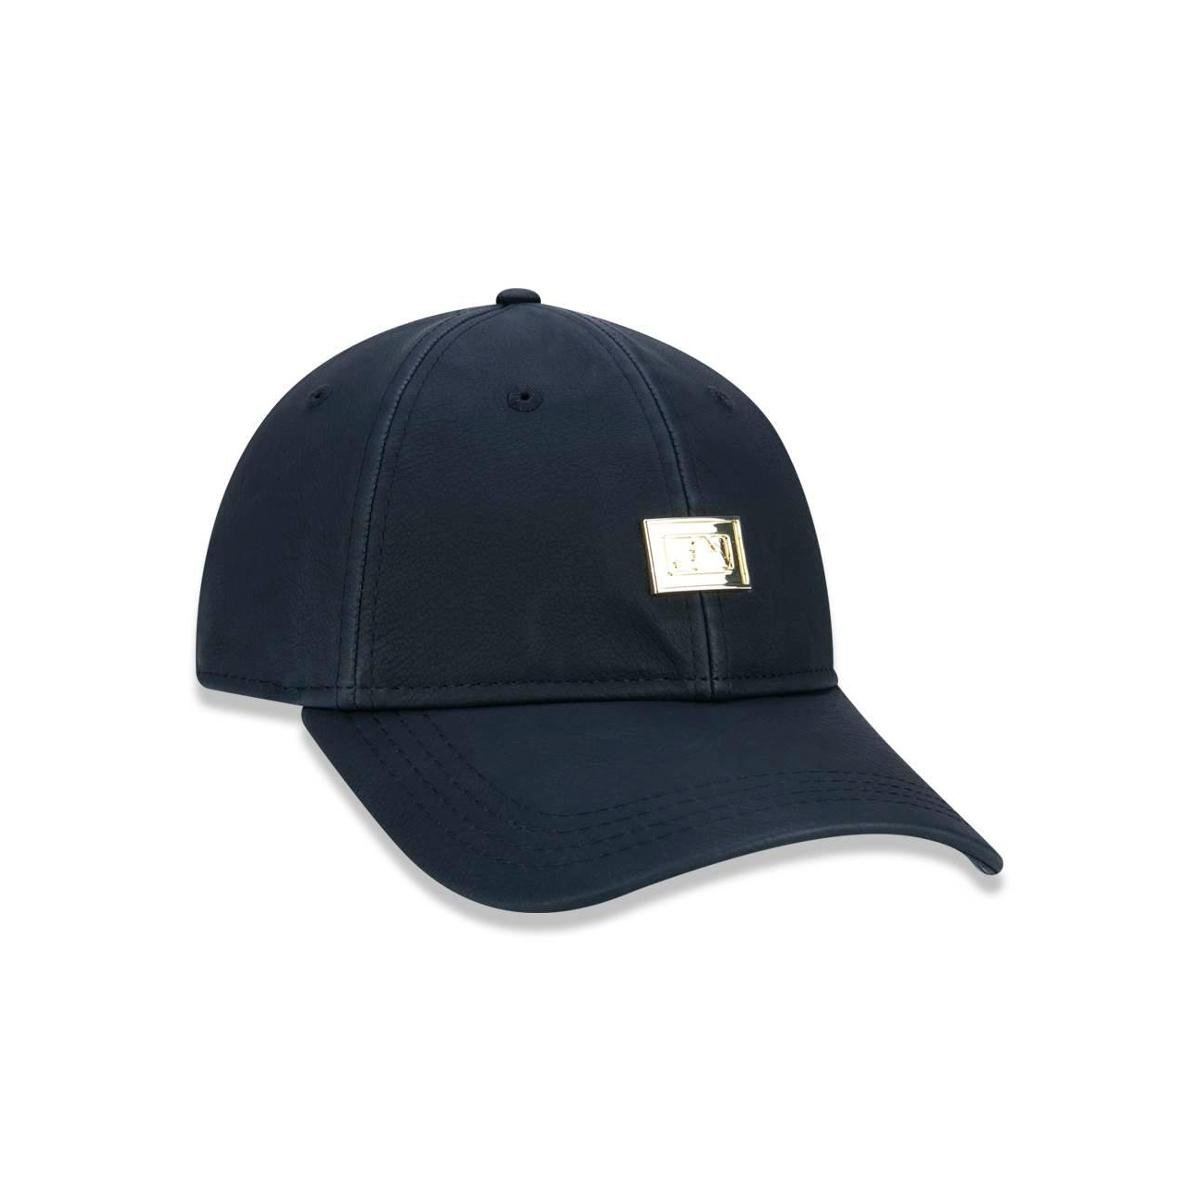 Boné 920 MLB Aba Curva New Era - Preto - Compre Agora  42954e63bb8